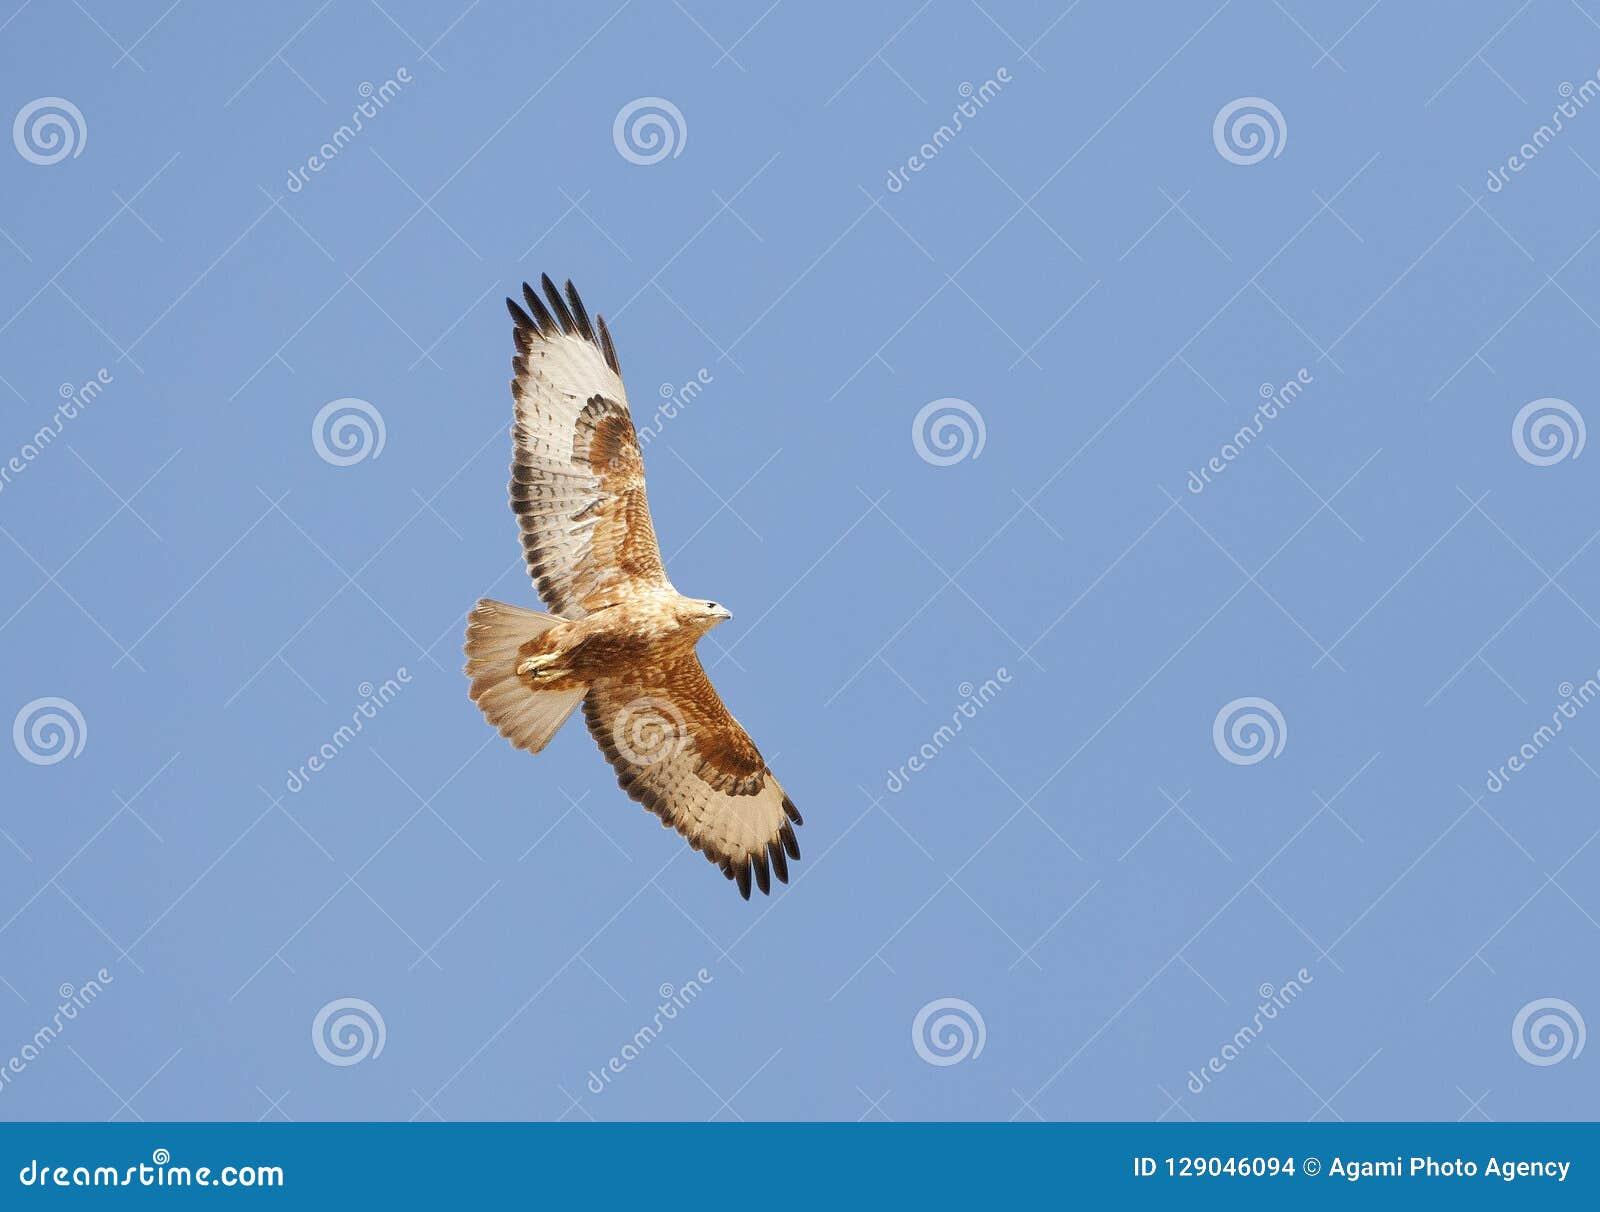 Arendbuizerd, Long-legged Buzzard, Buteo rufinus